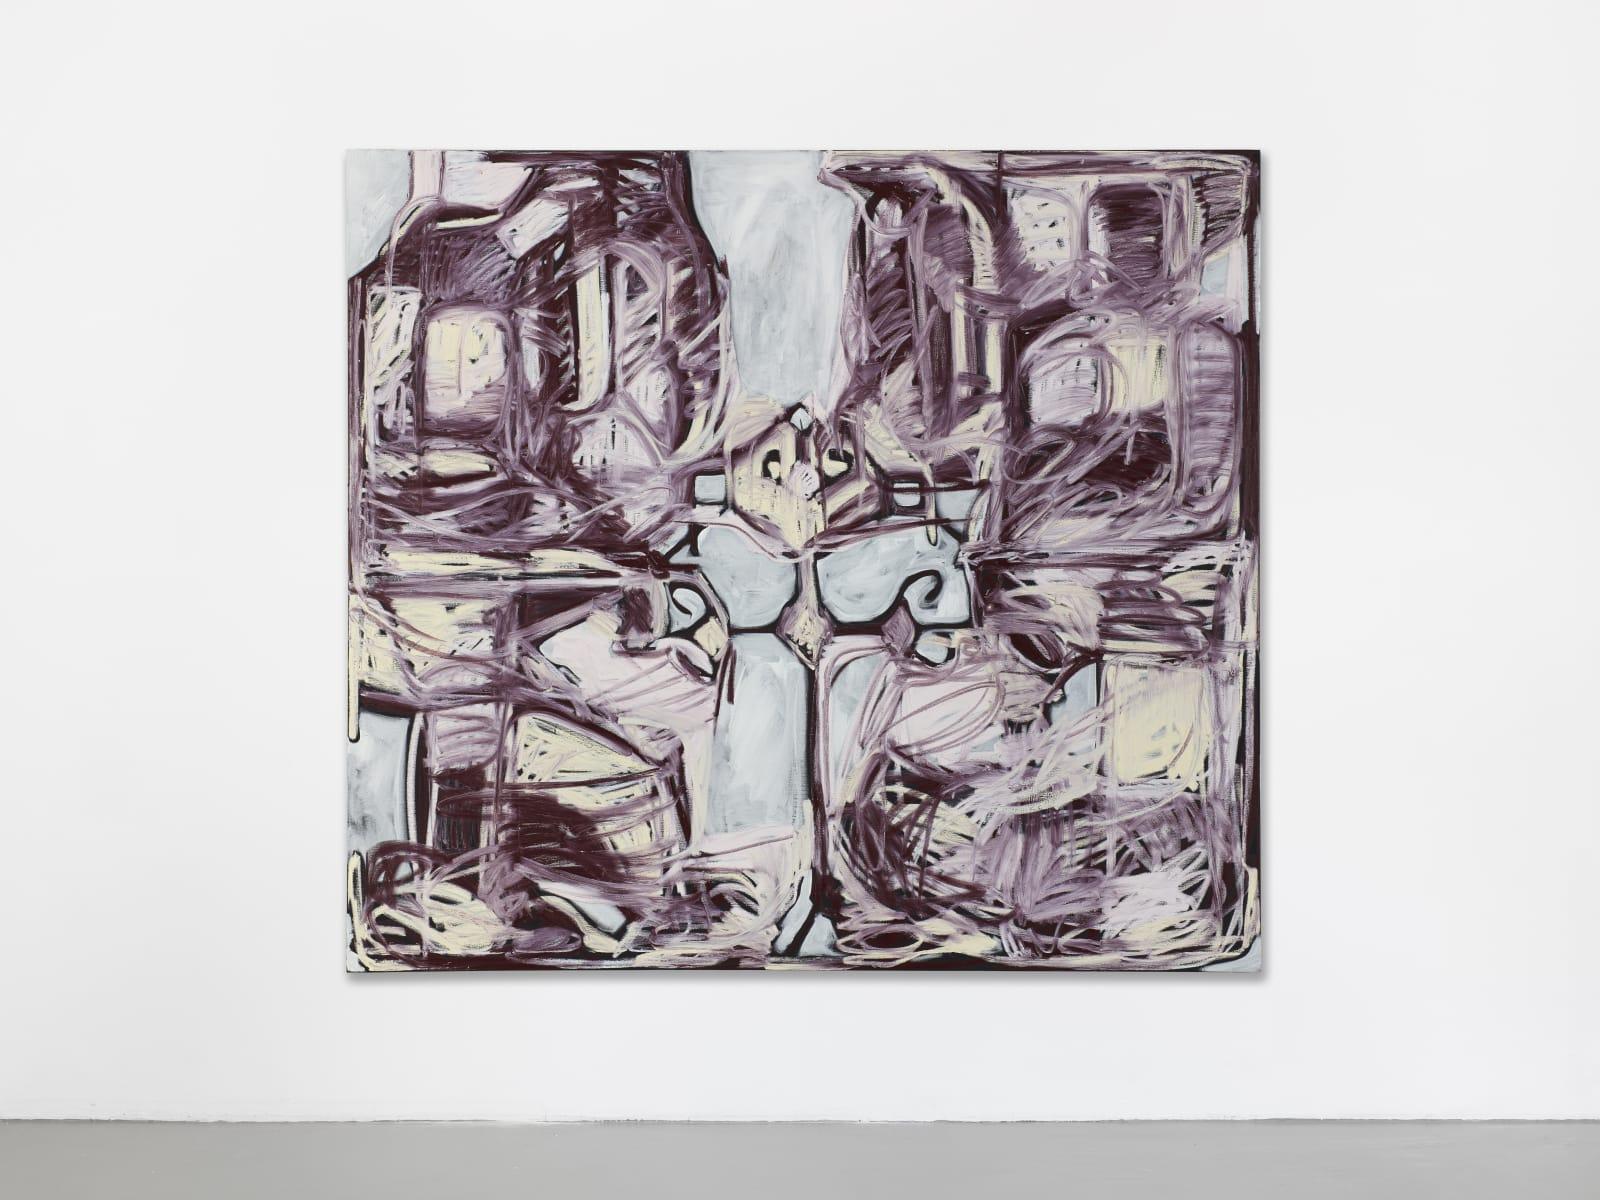 Melike Kara, Kochak+diamond, 2020, oil stick and acrylic on canvas, 180x200cm